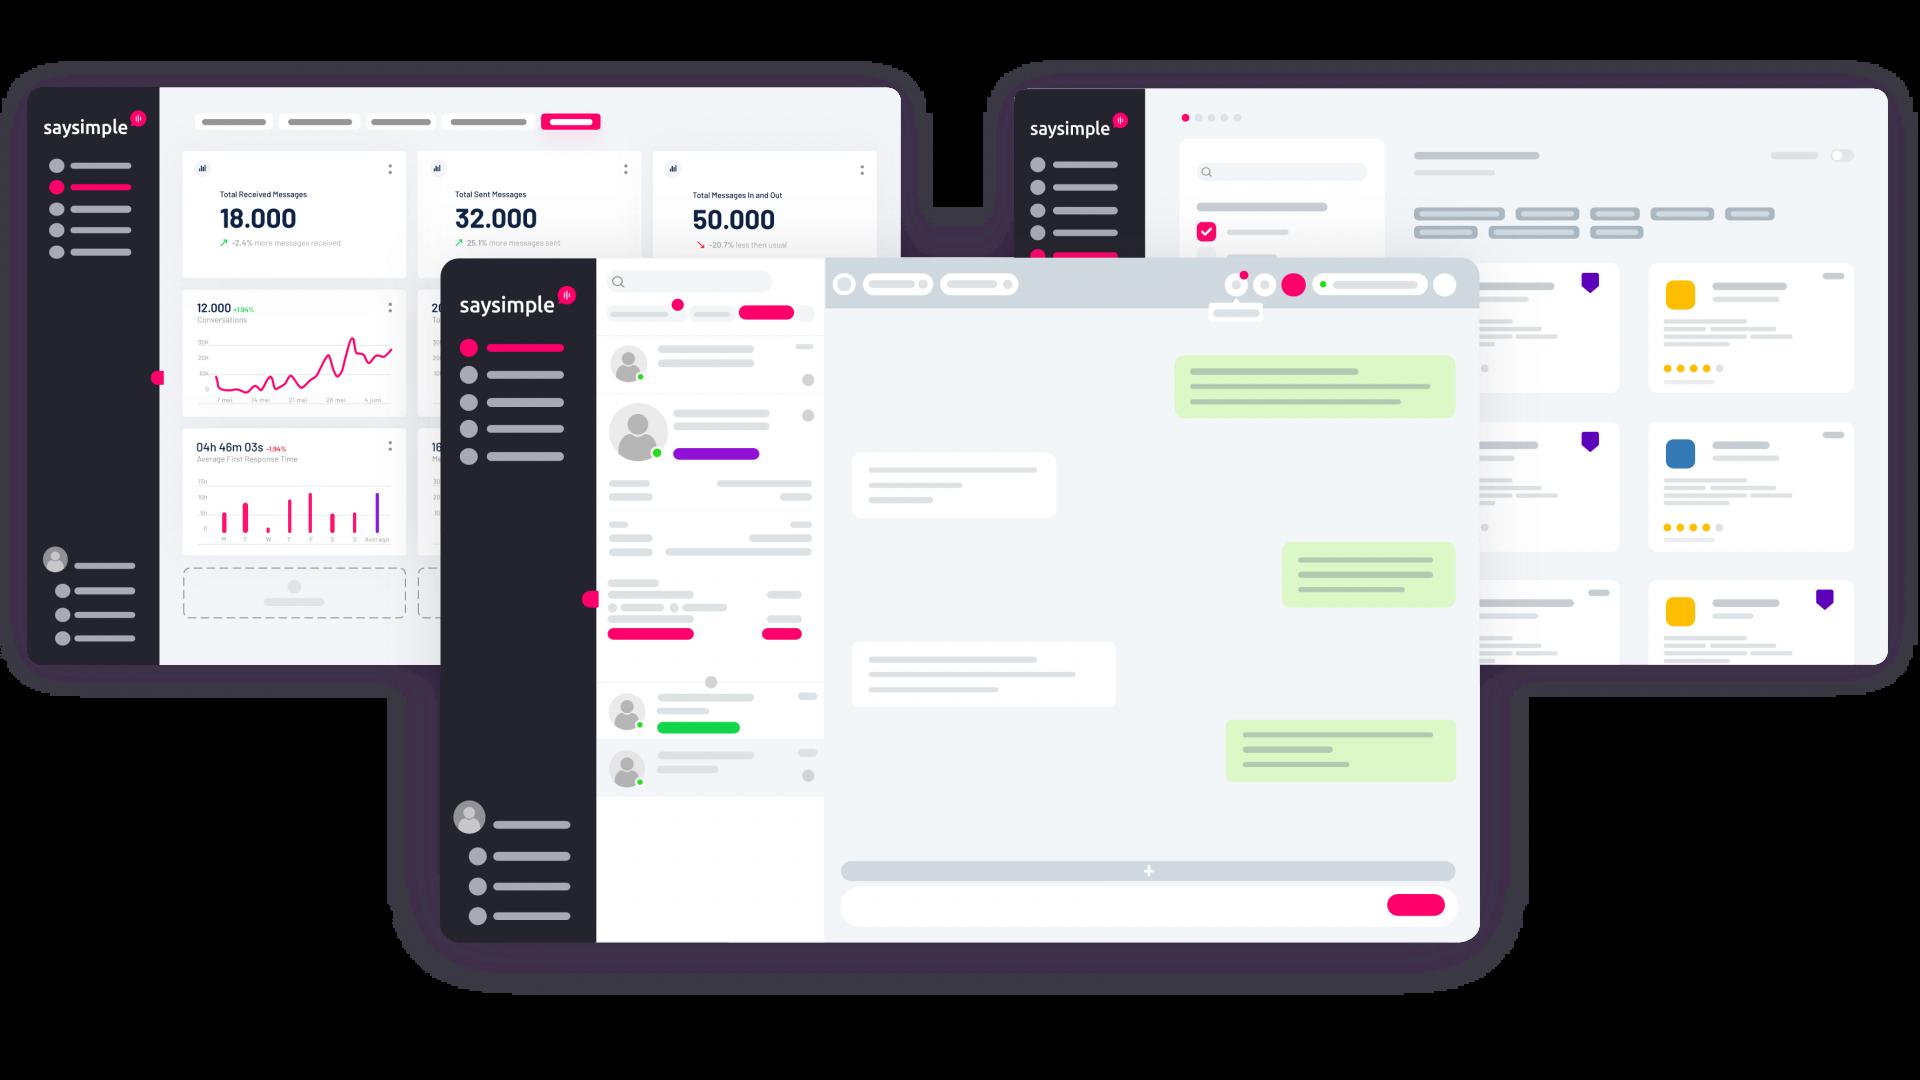 Saysimple customer communications platform